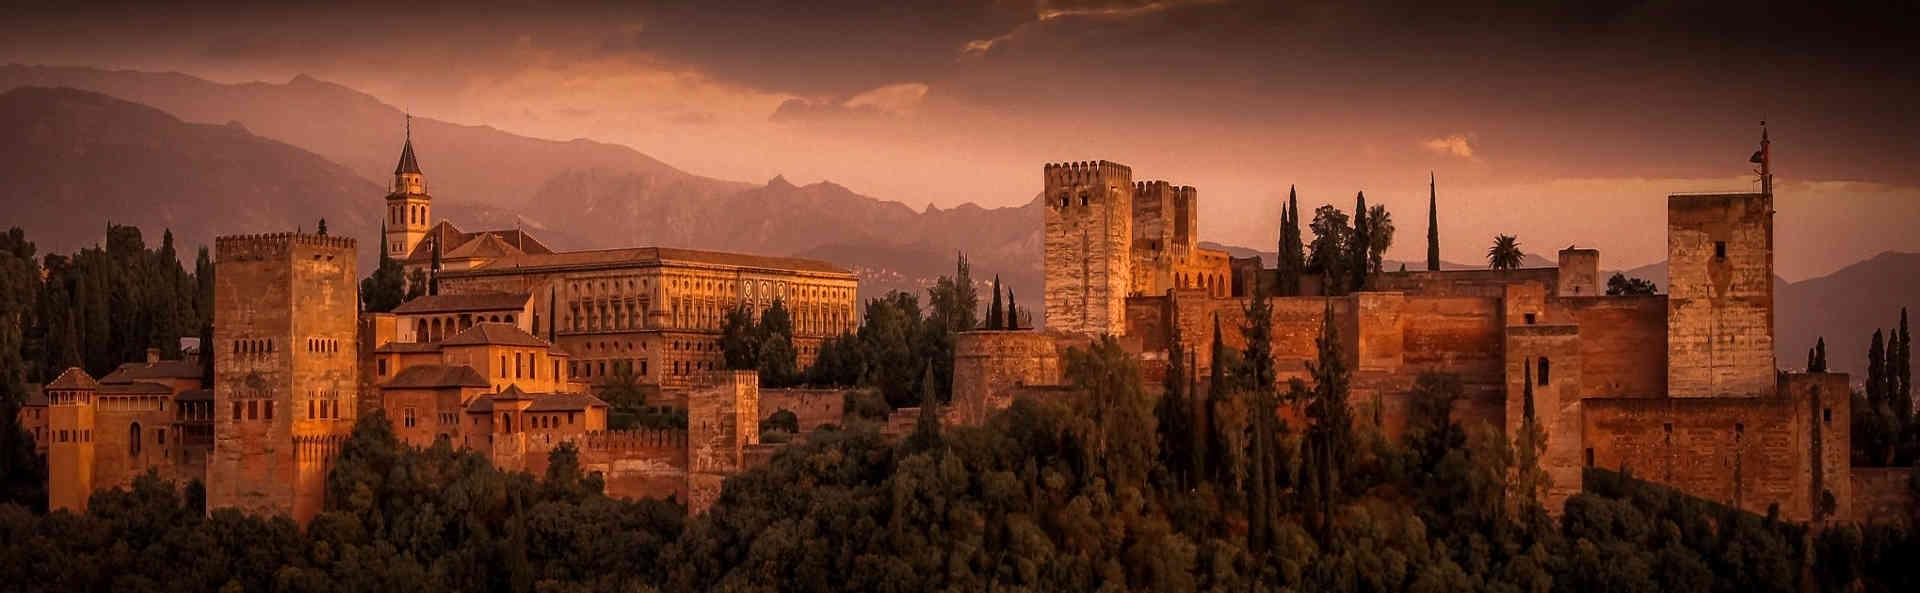 Alhambra - Halifax Beograd - Profesionalni prevod sa španskog na srpski i na španski sa srpskog